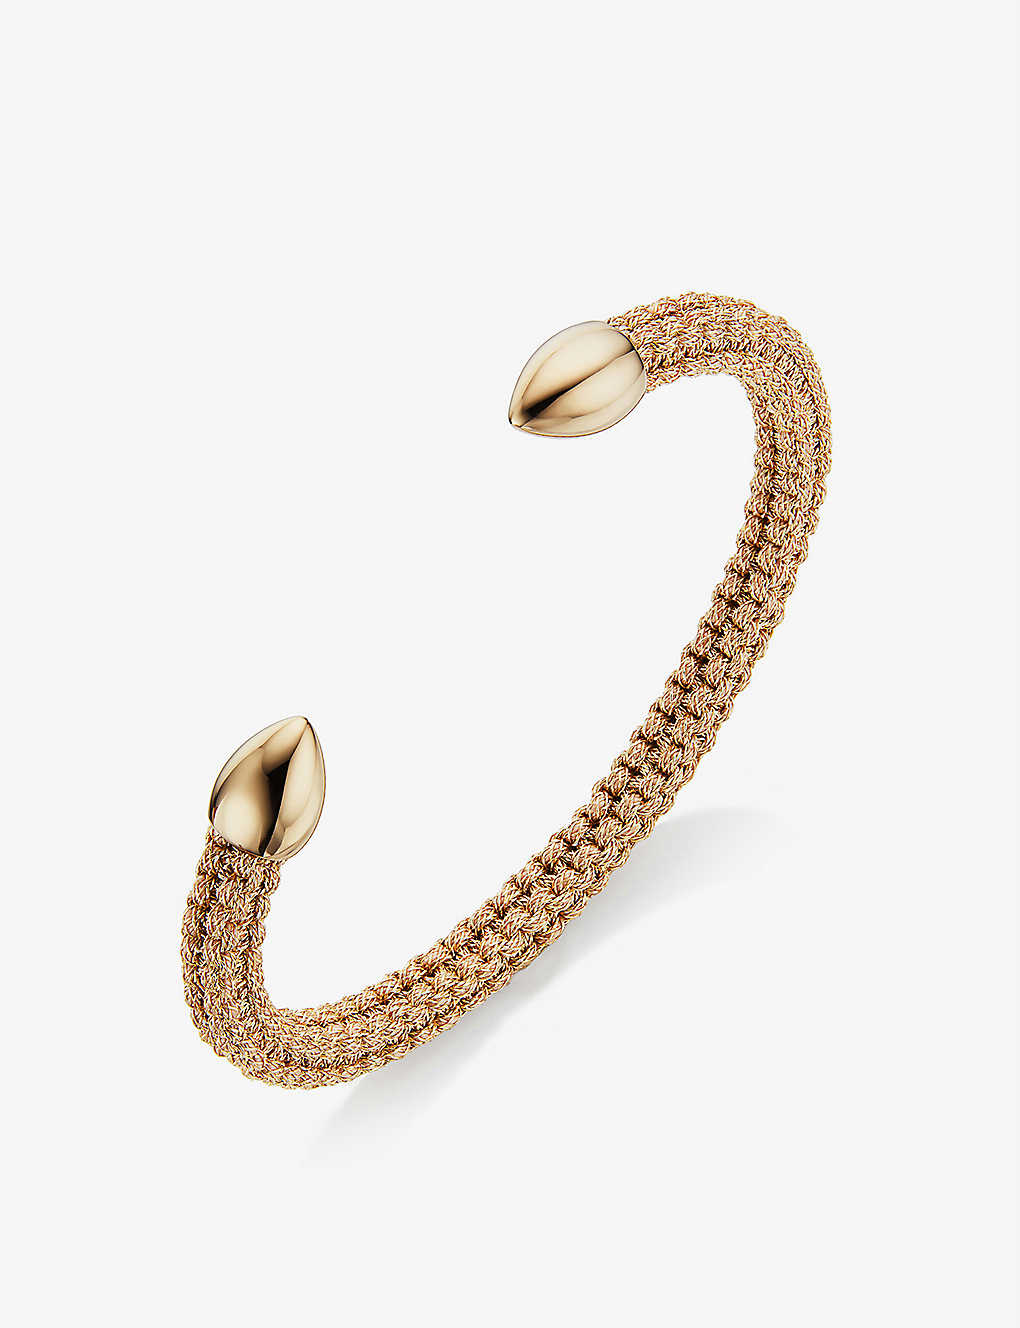 MONICA VINADER: Fiji Bud 18ct yellow gold-vermeil cuff bracelet